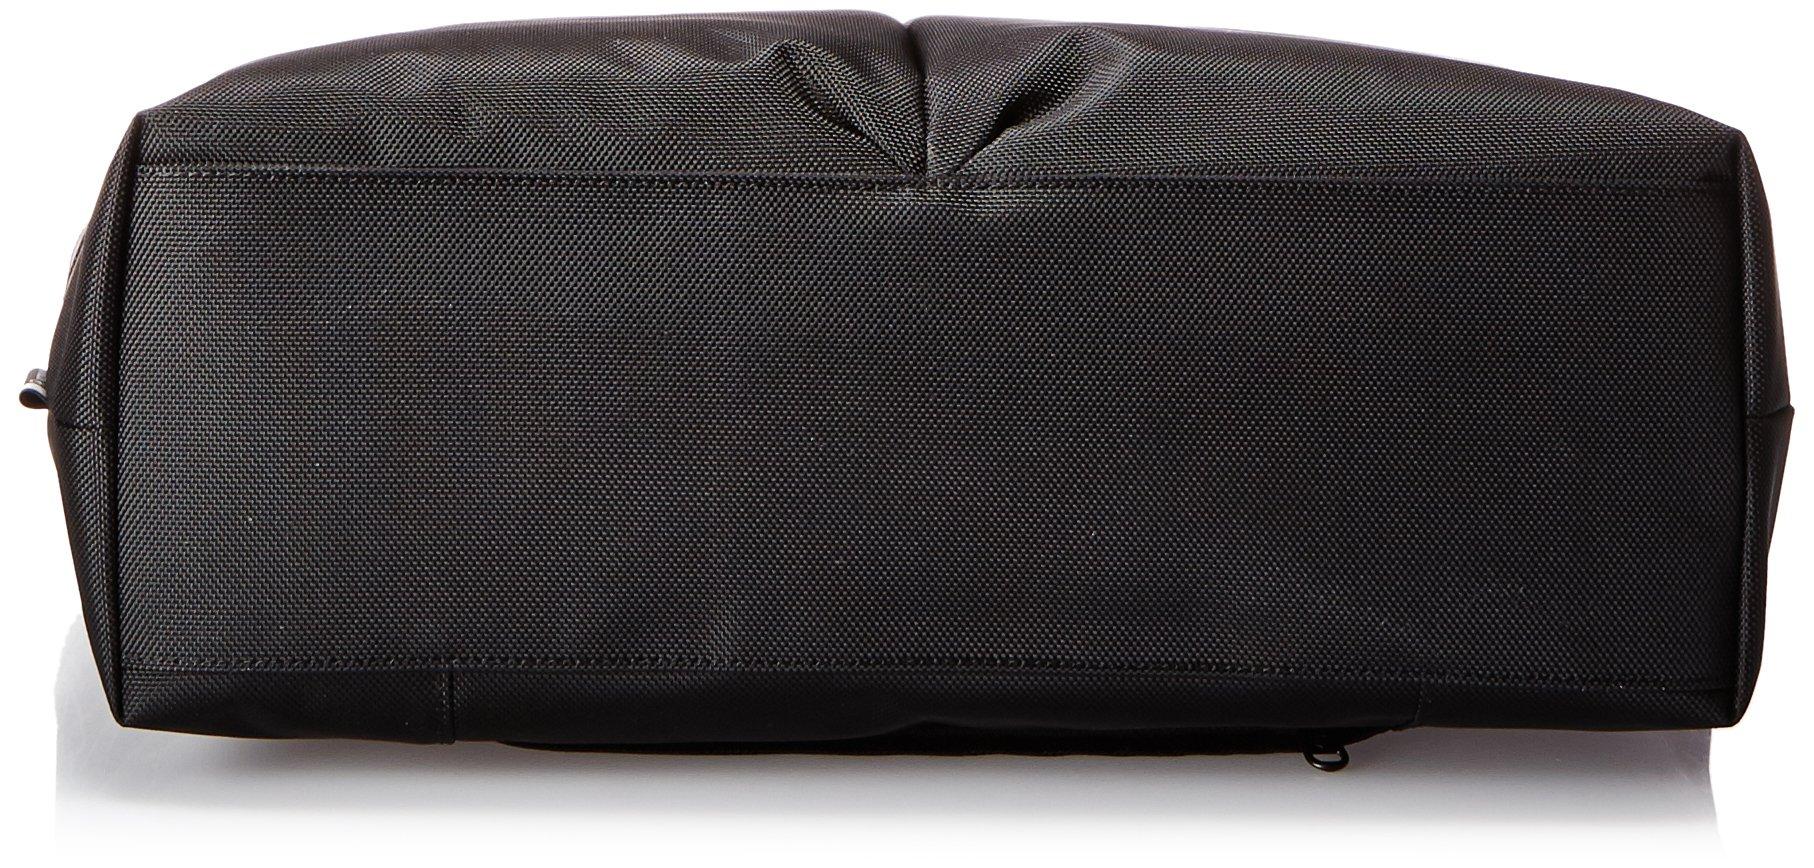 Victorinox Werks Traveler 5.0 WT Shopping Tote, Black, One Size by Victorinox (Image #5)